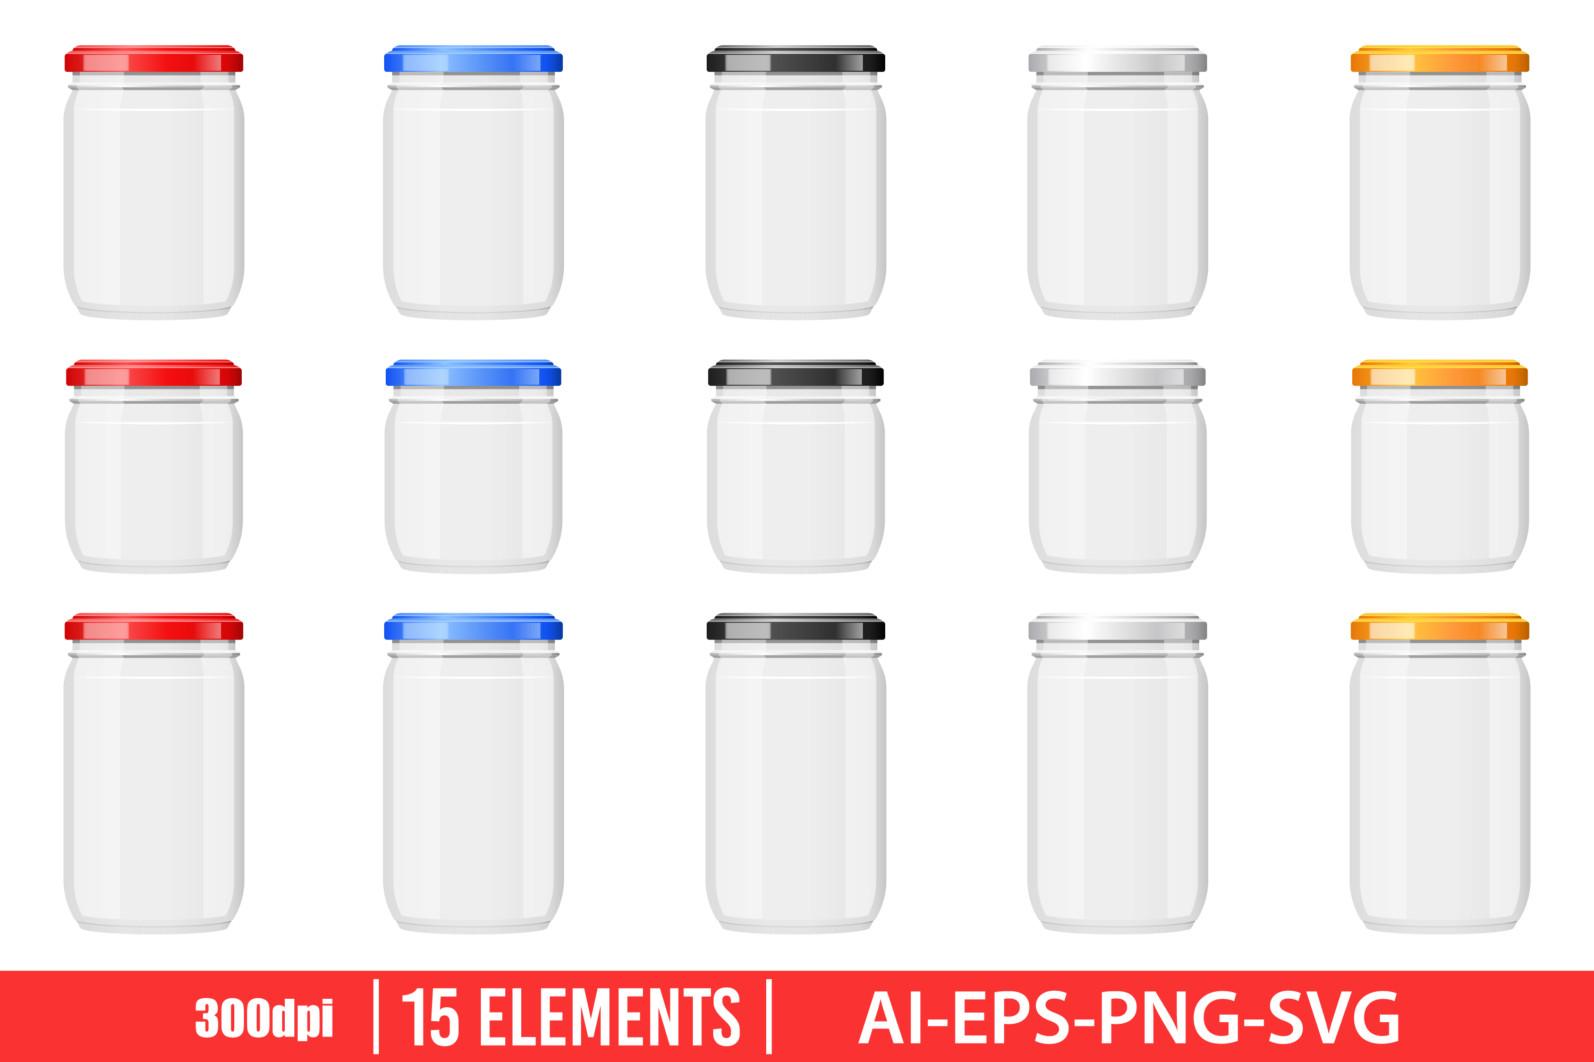 Empty glass jar clipart vector design illustration. Empty glass jar set. Vector Clipart Print - EMPTY GLASS JAR scaled -